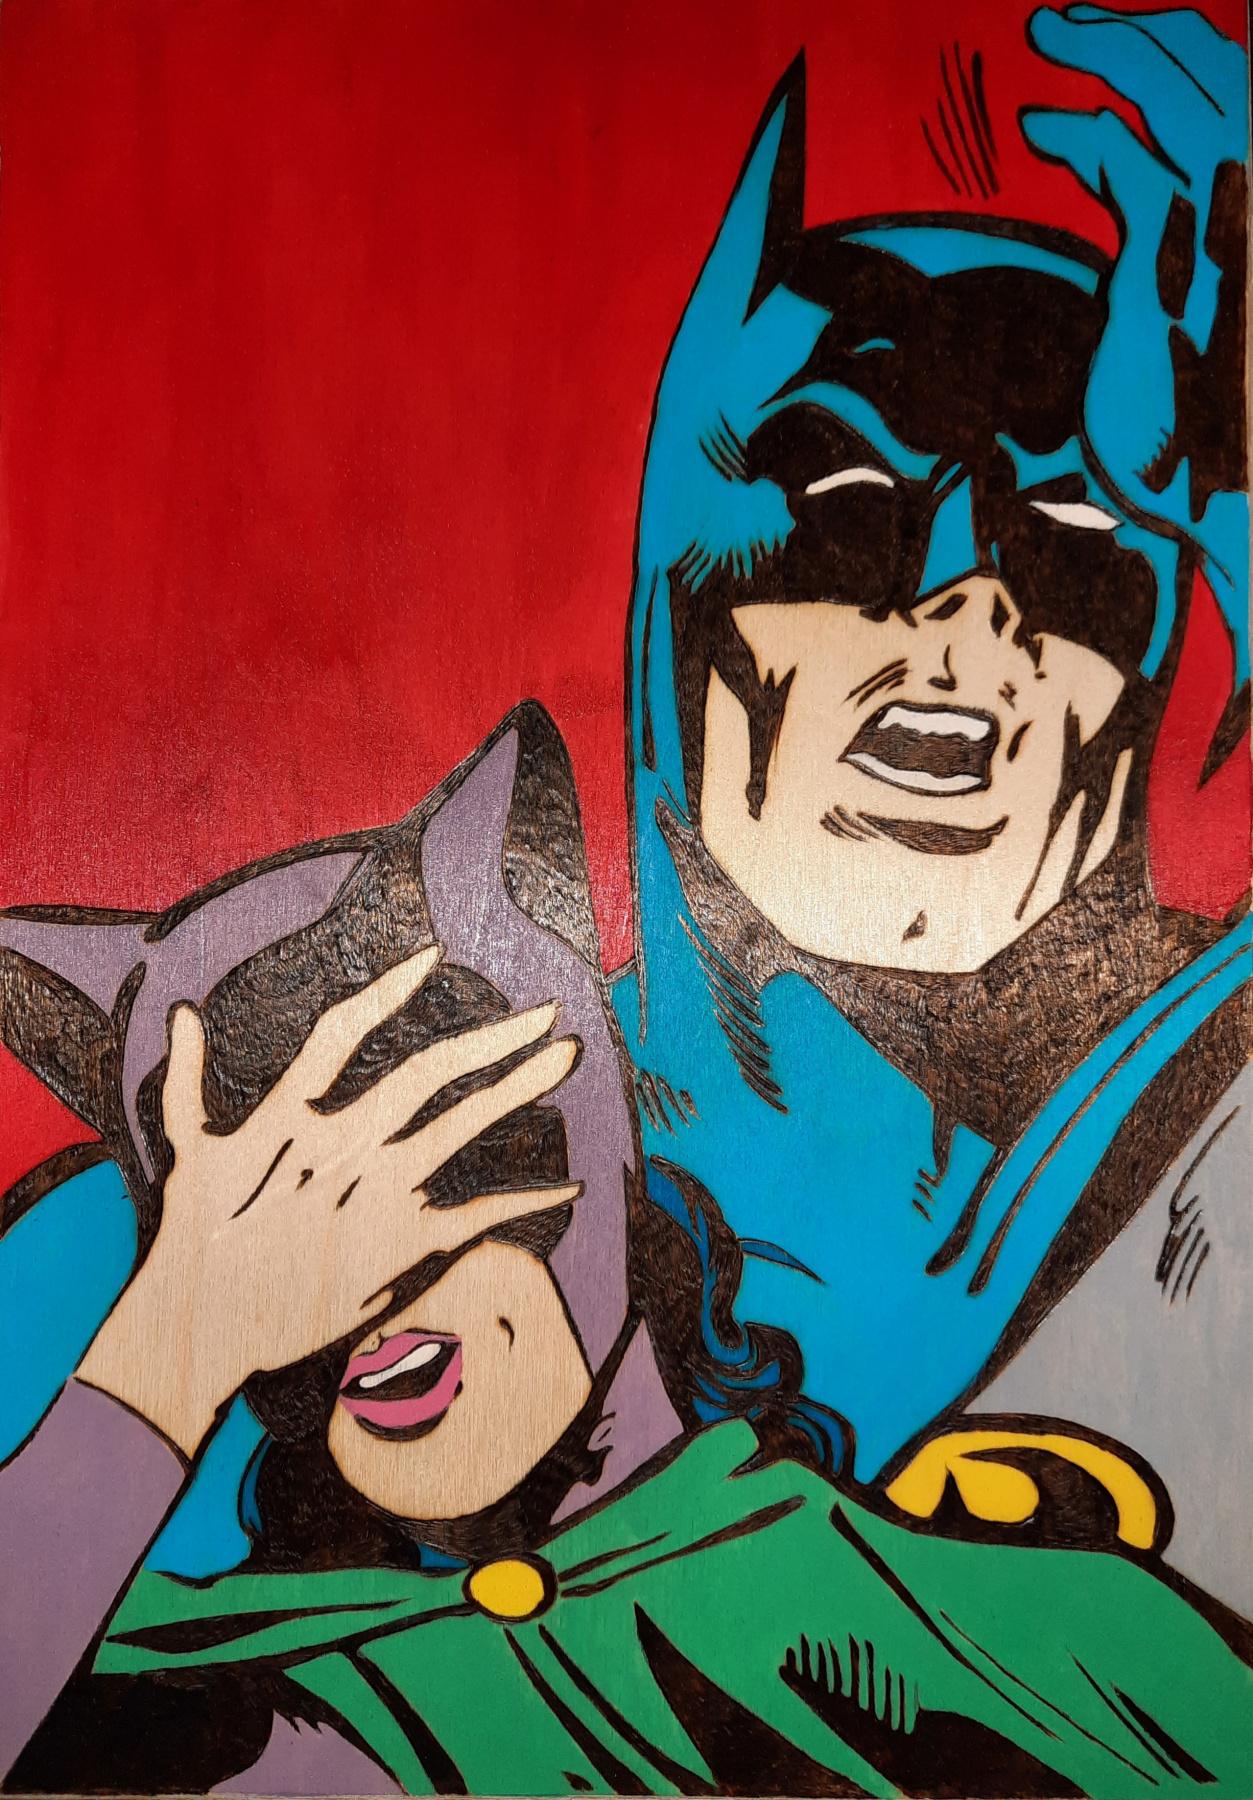 Ангелина Андреевна Гладышева. Catwoman and batman